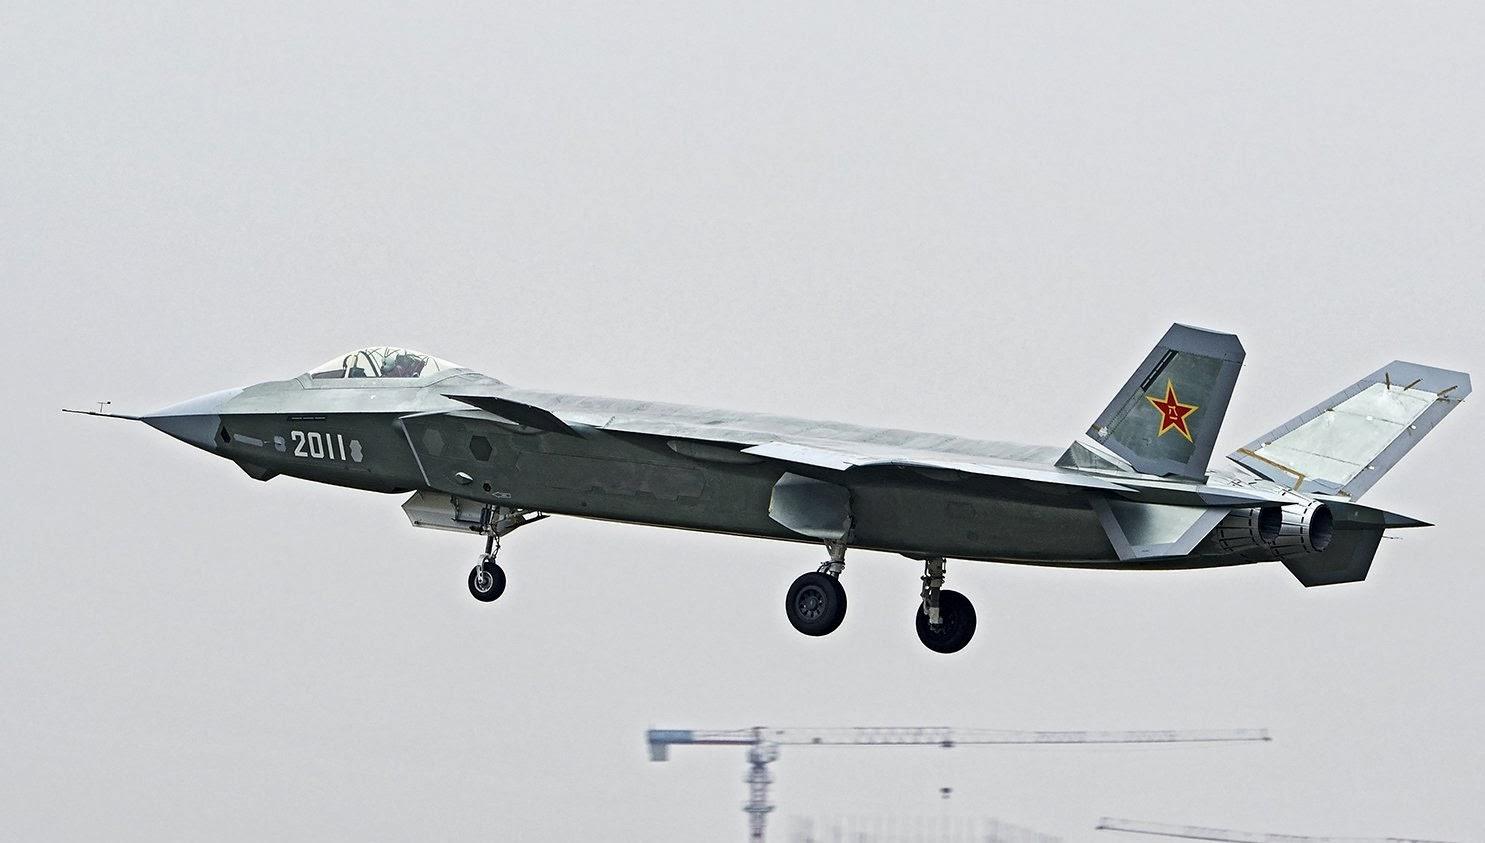 Más detalles del Chengdu J-20 - Página 13 J-20+2011+-+26.2.14++J-20+2011+-+17.2.14+0grey+J-20+2011+J-20+2004+56J-20+2004+-+25.9.13+J-20+20023456789+-+open+2+PL-12+PL-10+PL-15+J-20+Mighty+Dragon++Chengdu+J-20+fifth+generation+stealth,+engine++(5)